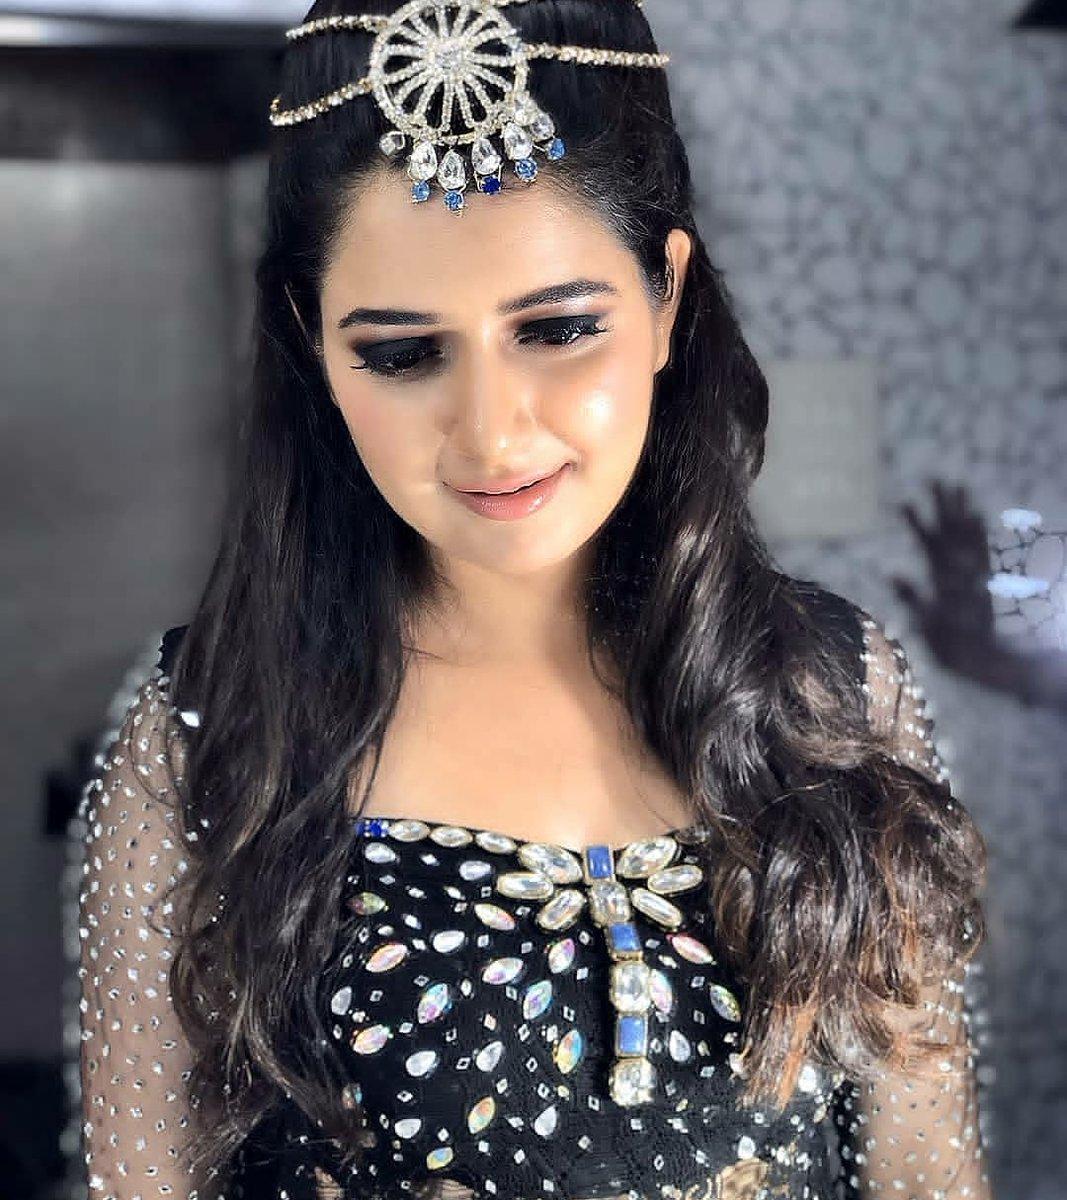 Gorgeous #Ashikaranganath   Follow @cinimall  #cinimall #Ashikaranganath #kannadaactress pic.twitter.com/GEFJQVWb1T